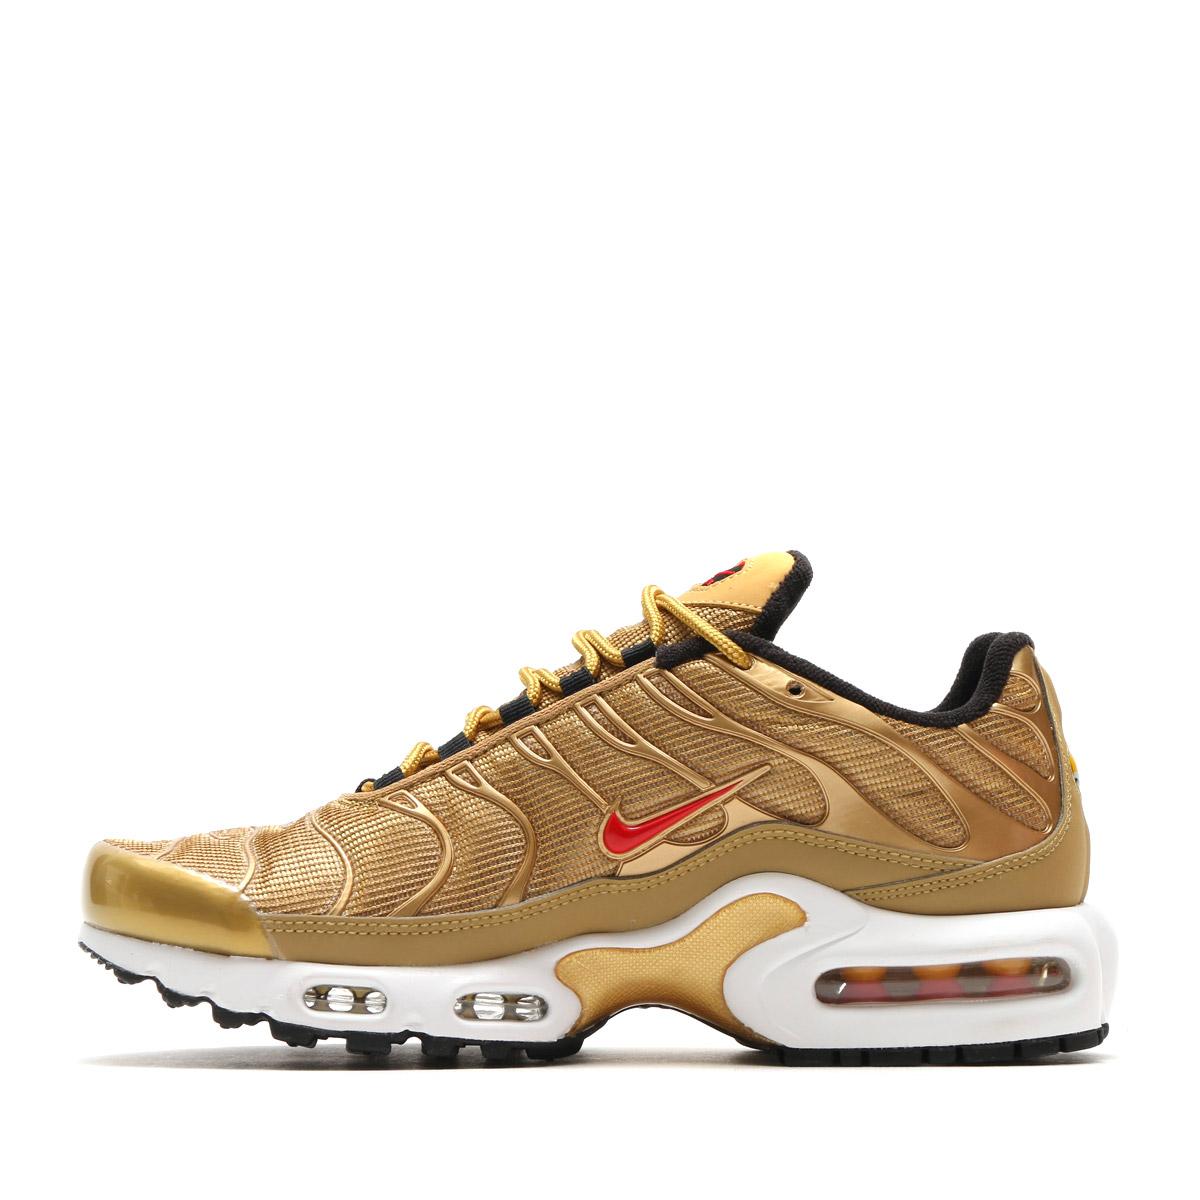 NIKE WMNS AIR MAX PLUS QS (Nike women Air Max plus QS) (METALLIC GOLD/UNIVERSITY RED) 17SU-S